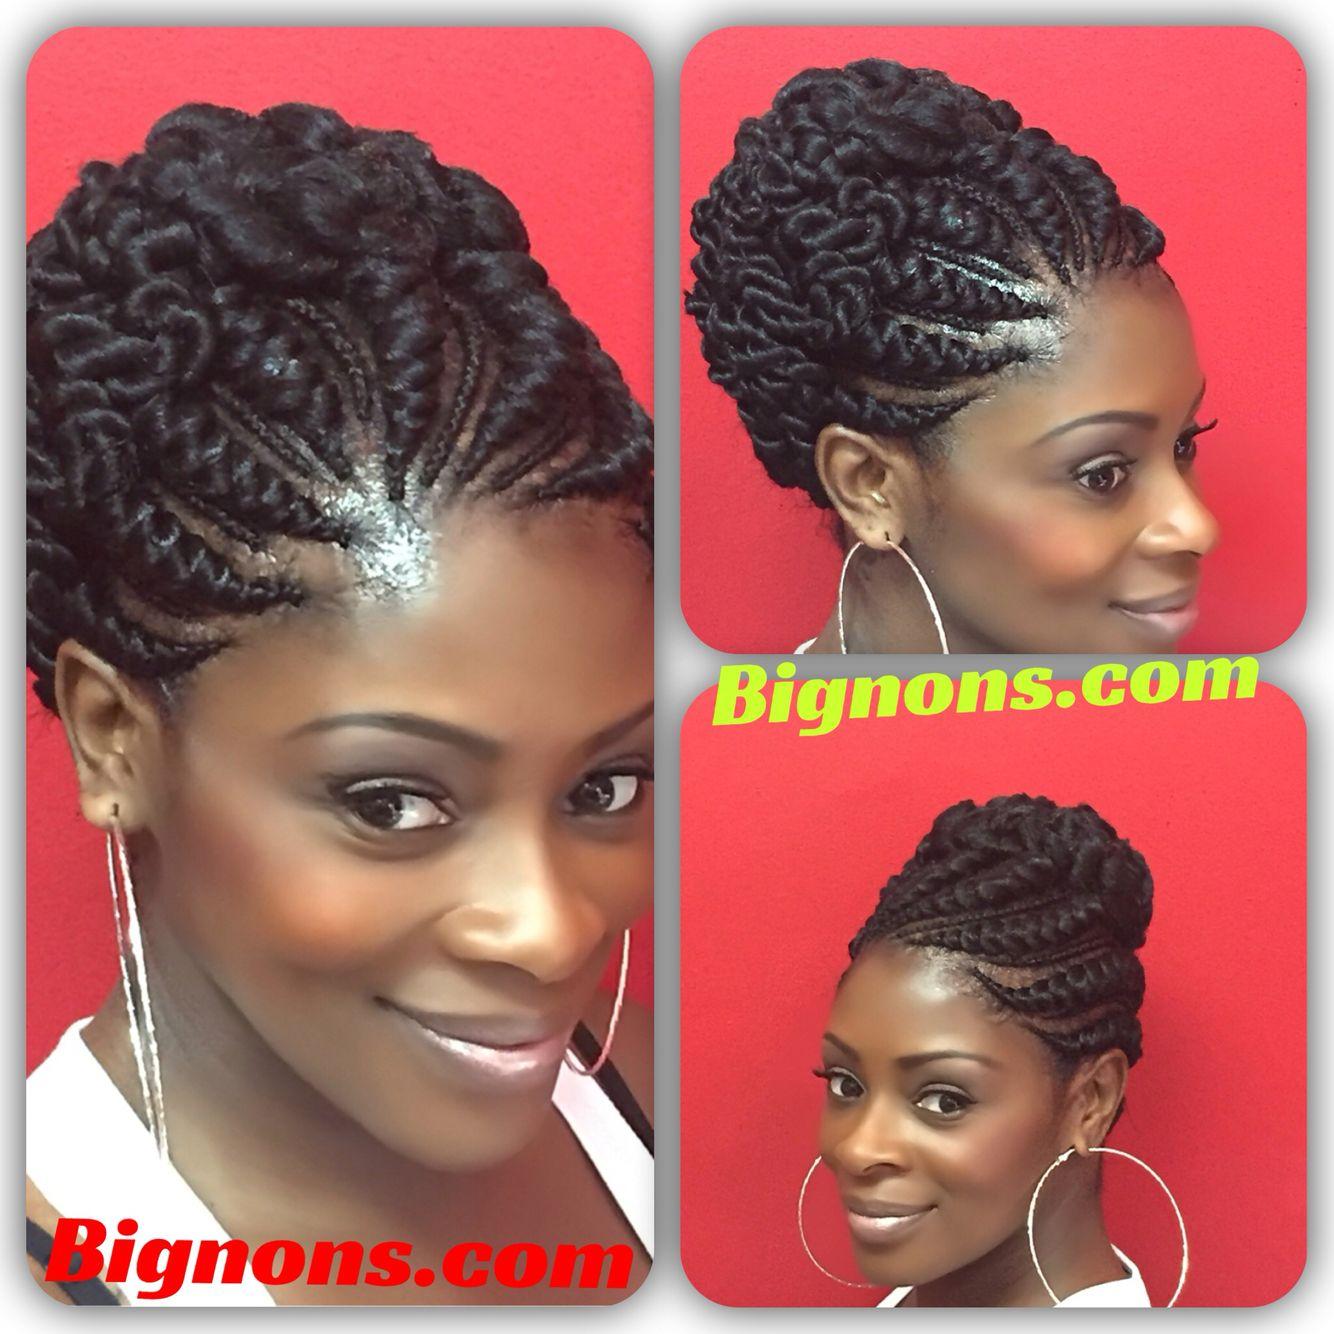 African Braid Hairstyles Bignon's African Hair Braiding Torssadee Cornrow  Bobs  Pinterest